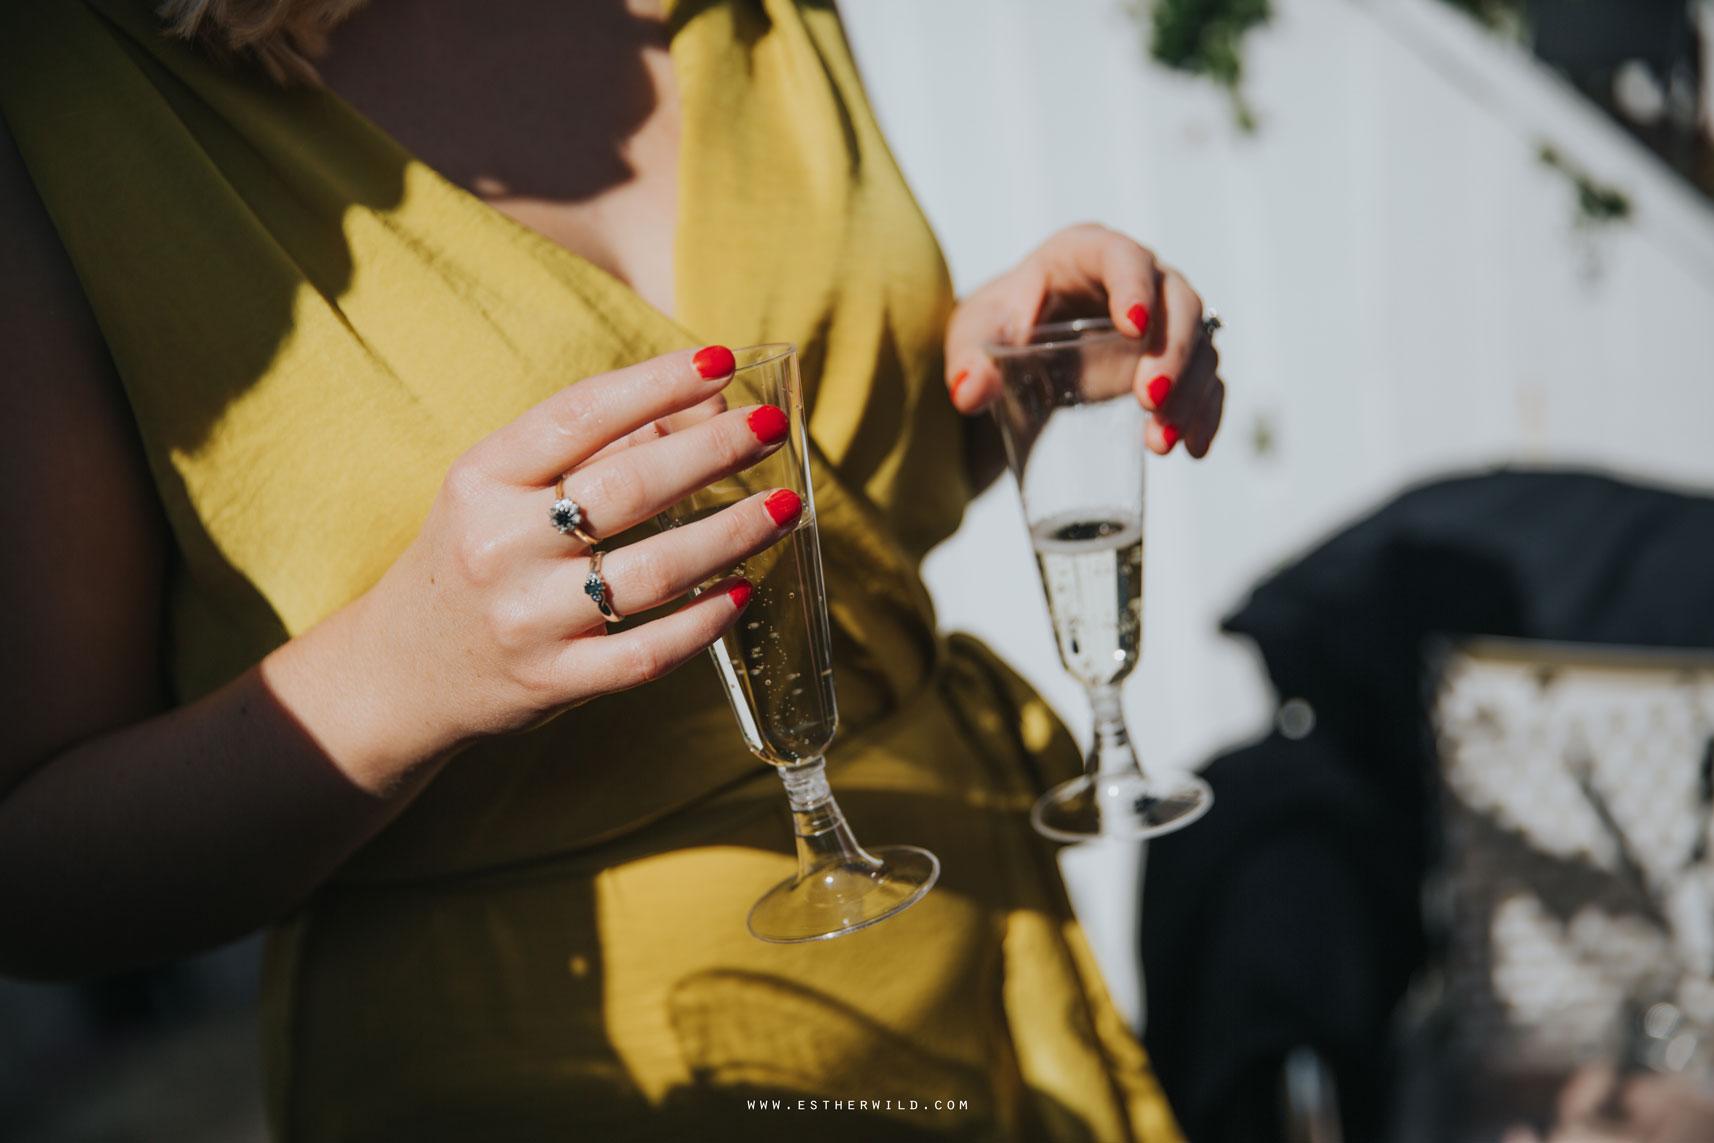 Cromer_Wedding_Beach_Outdoor_Ceremony_Norfolk_North_Lodge_Registry_Office_Rocket_House_Cafe_Cromer_Pier_IMG_3420_IMGL7555.jpg